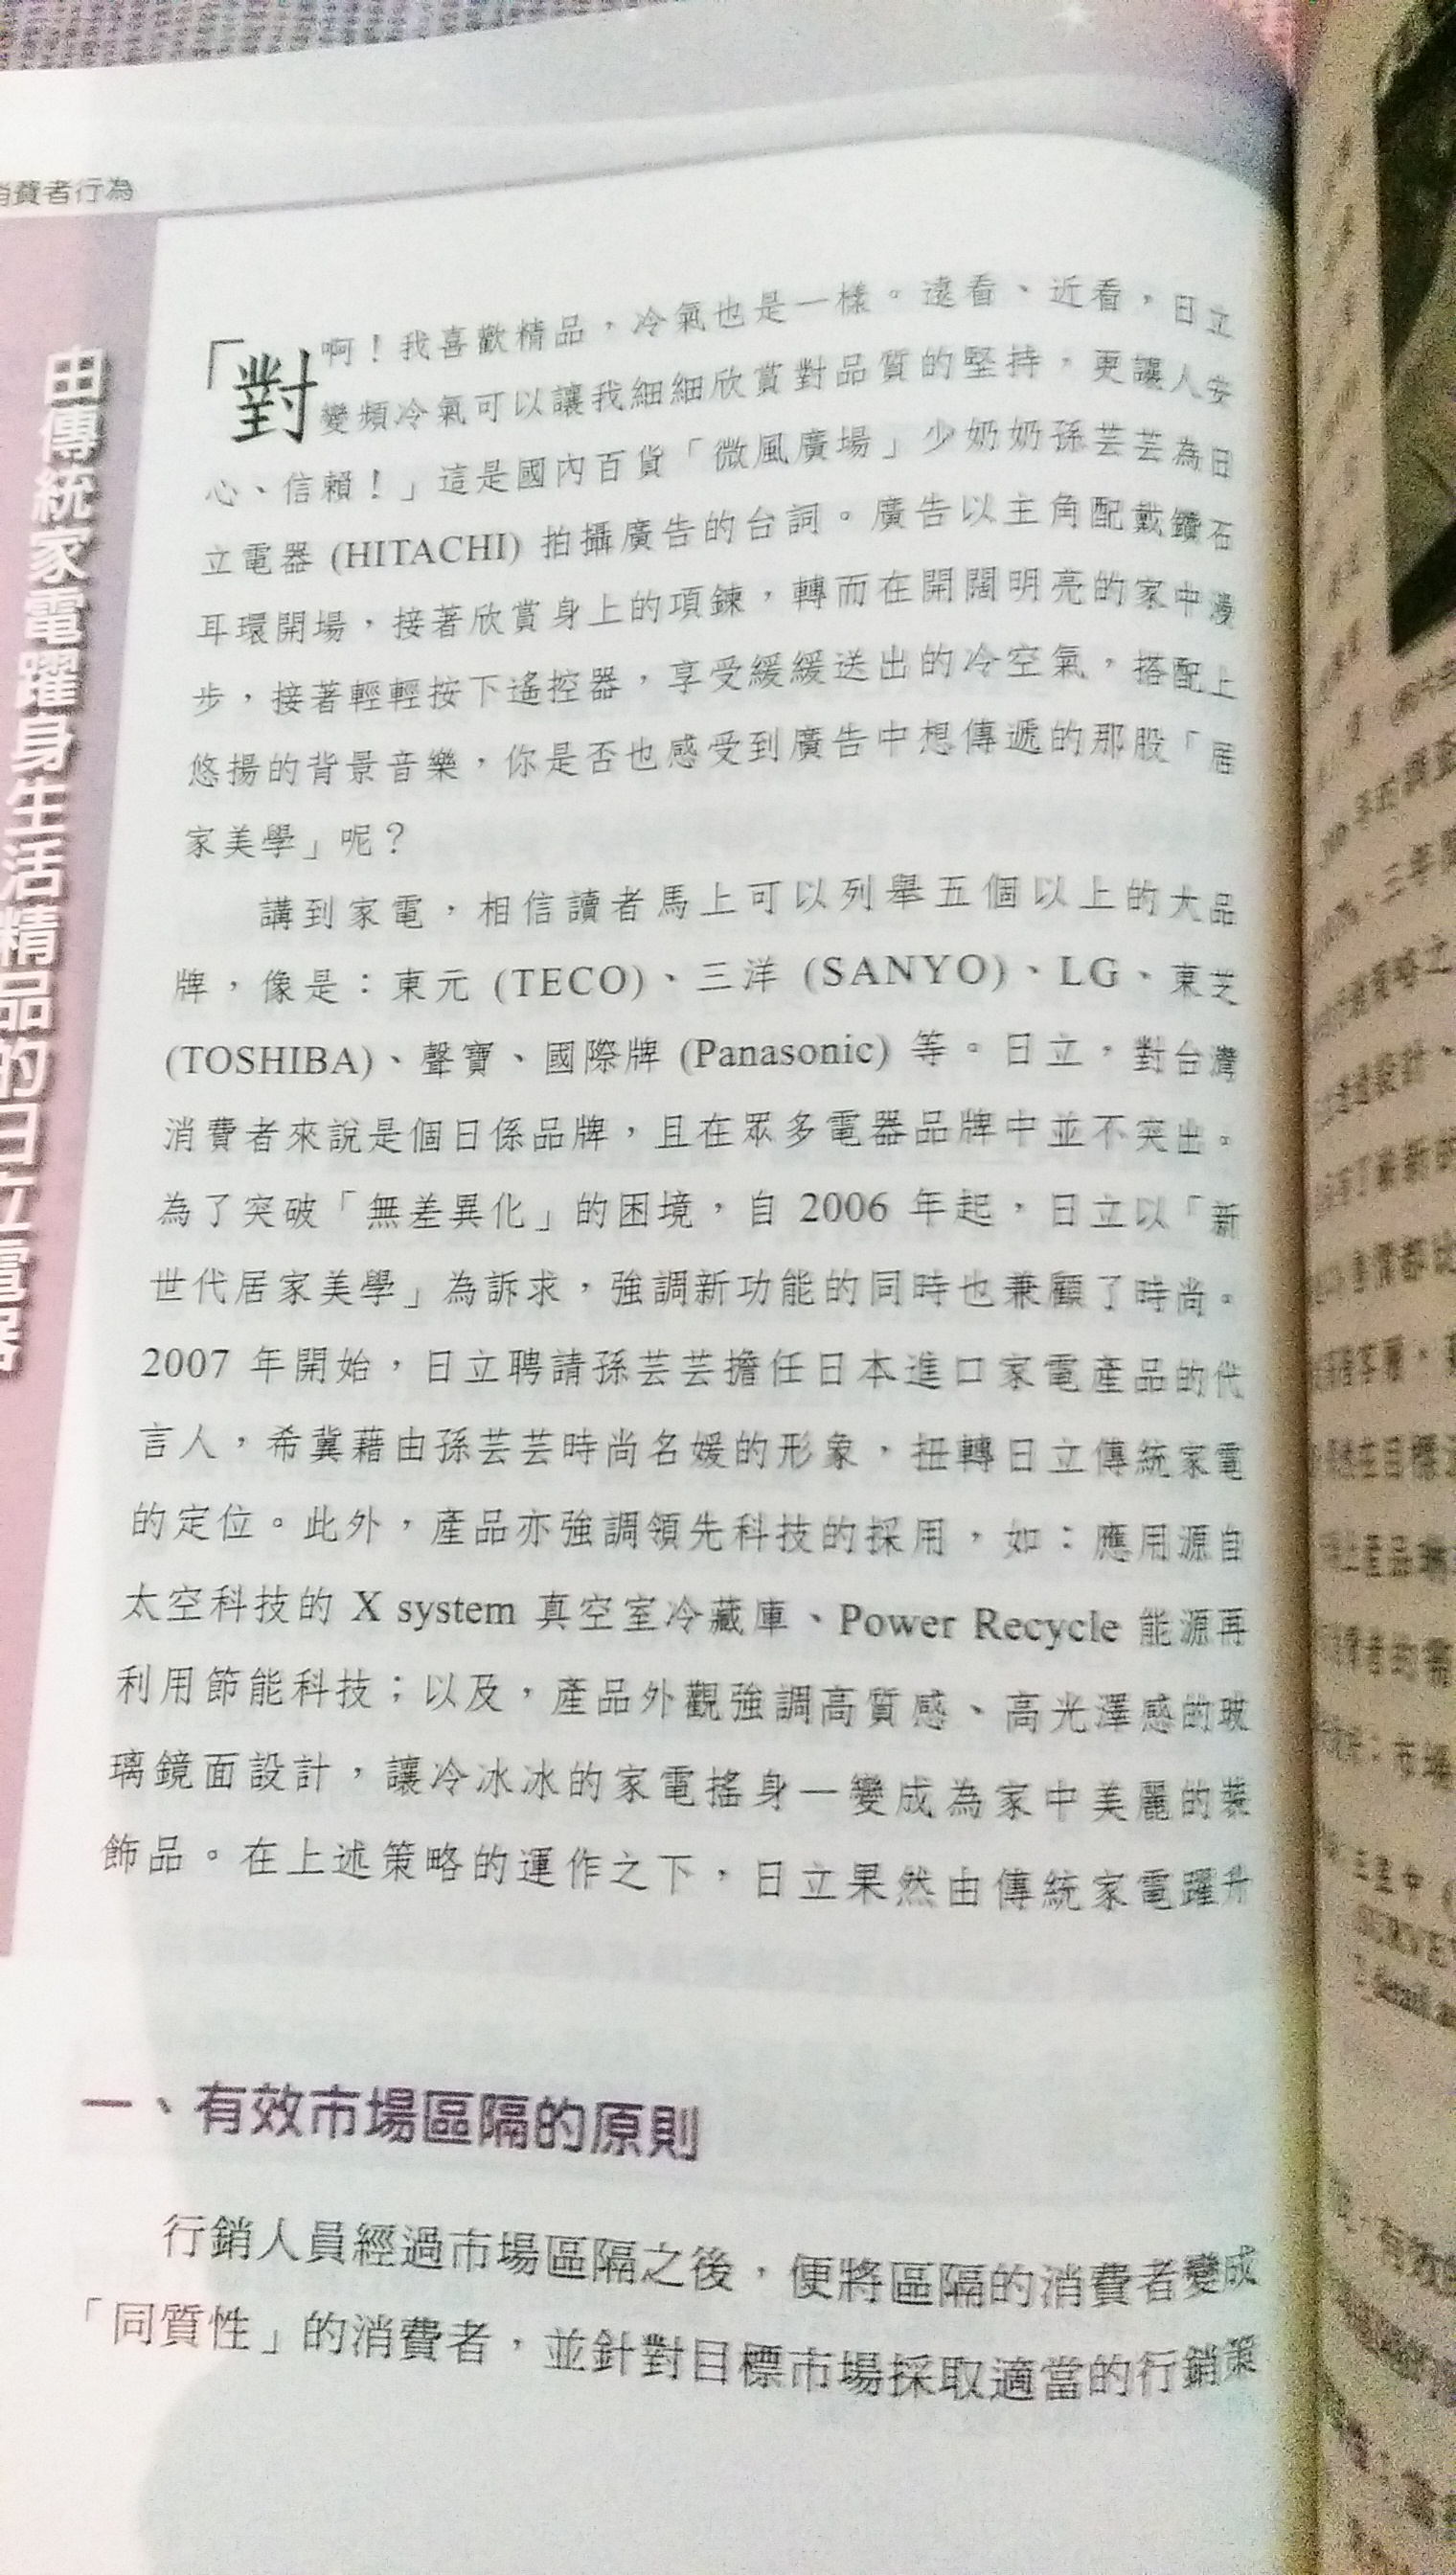 消費者行為 - Magazine cover